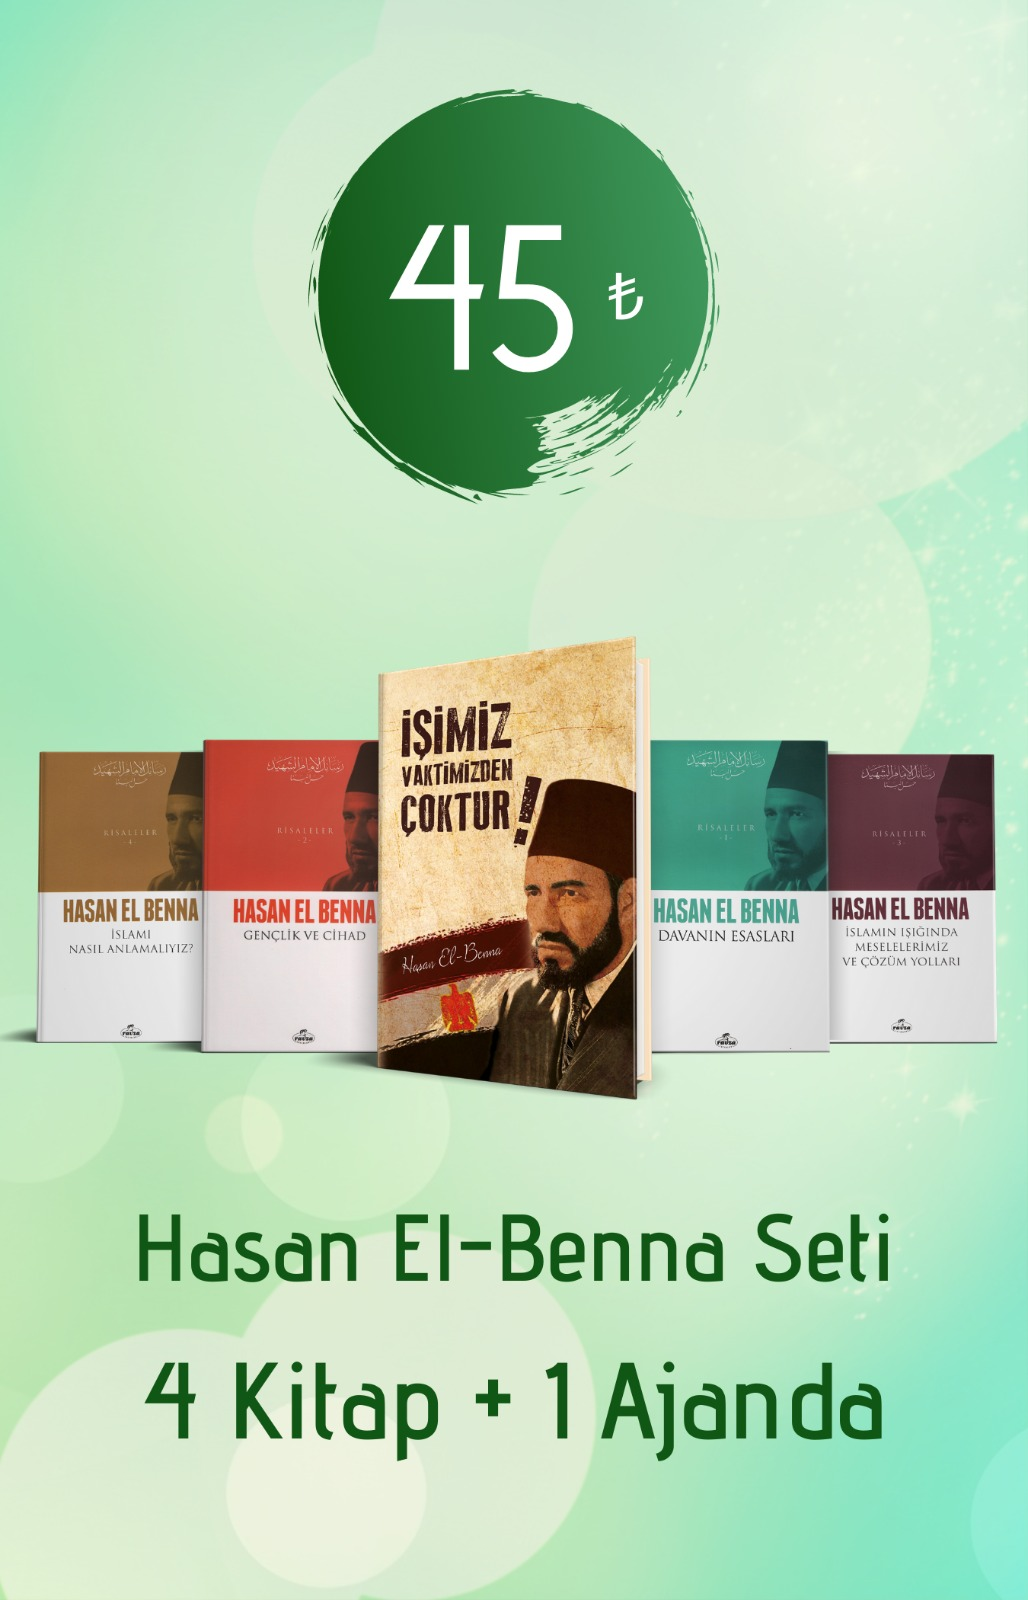 Hasan El Benna Seti